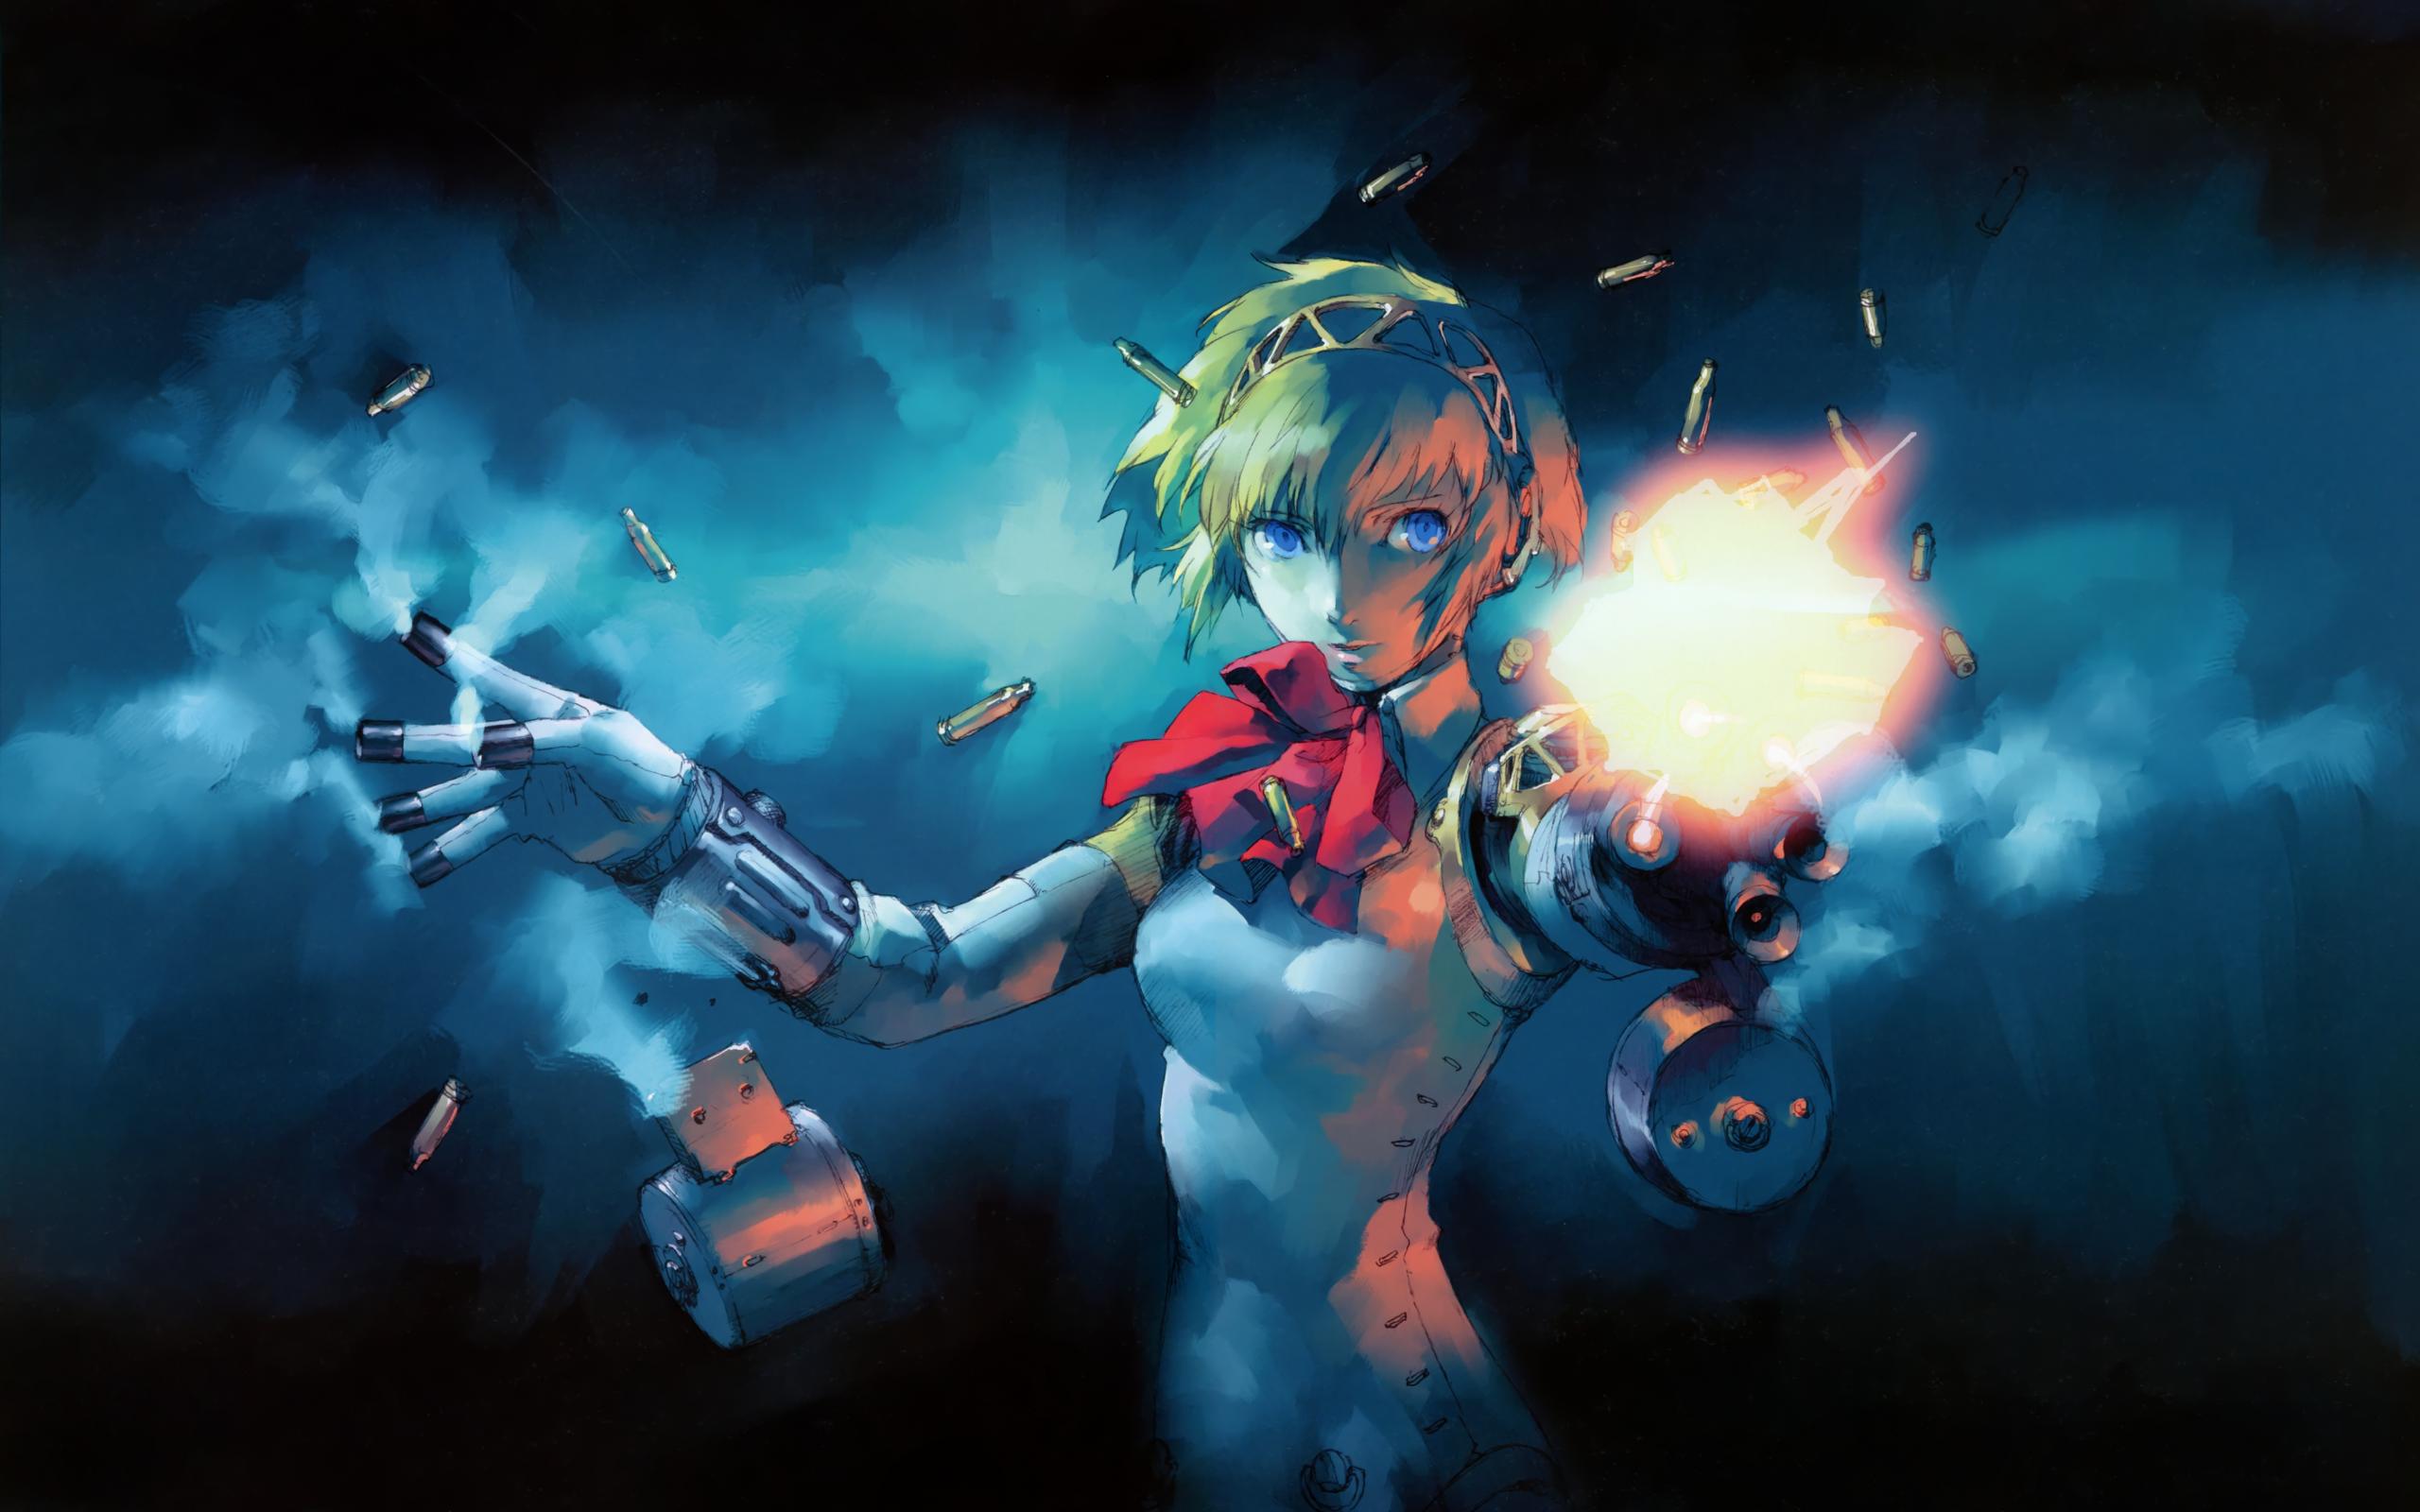 persona 3 anime drawing games weapons sci fi futuristic girl art wallpaper 2560x1600 30963 wallpaperup